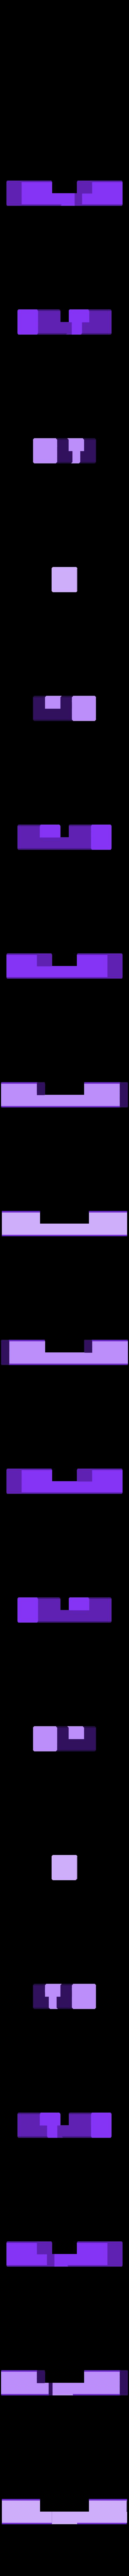 B.stl Download free STL file Mini Puzzle Puzzle • 3D printer model, Bdz37